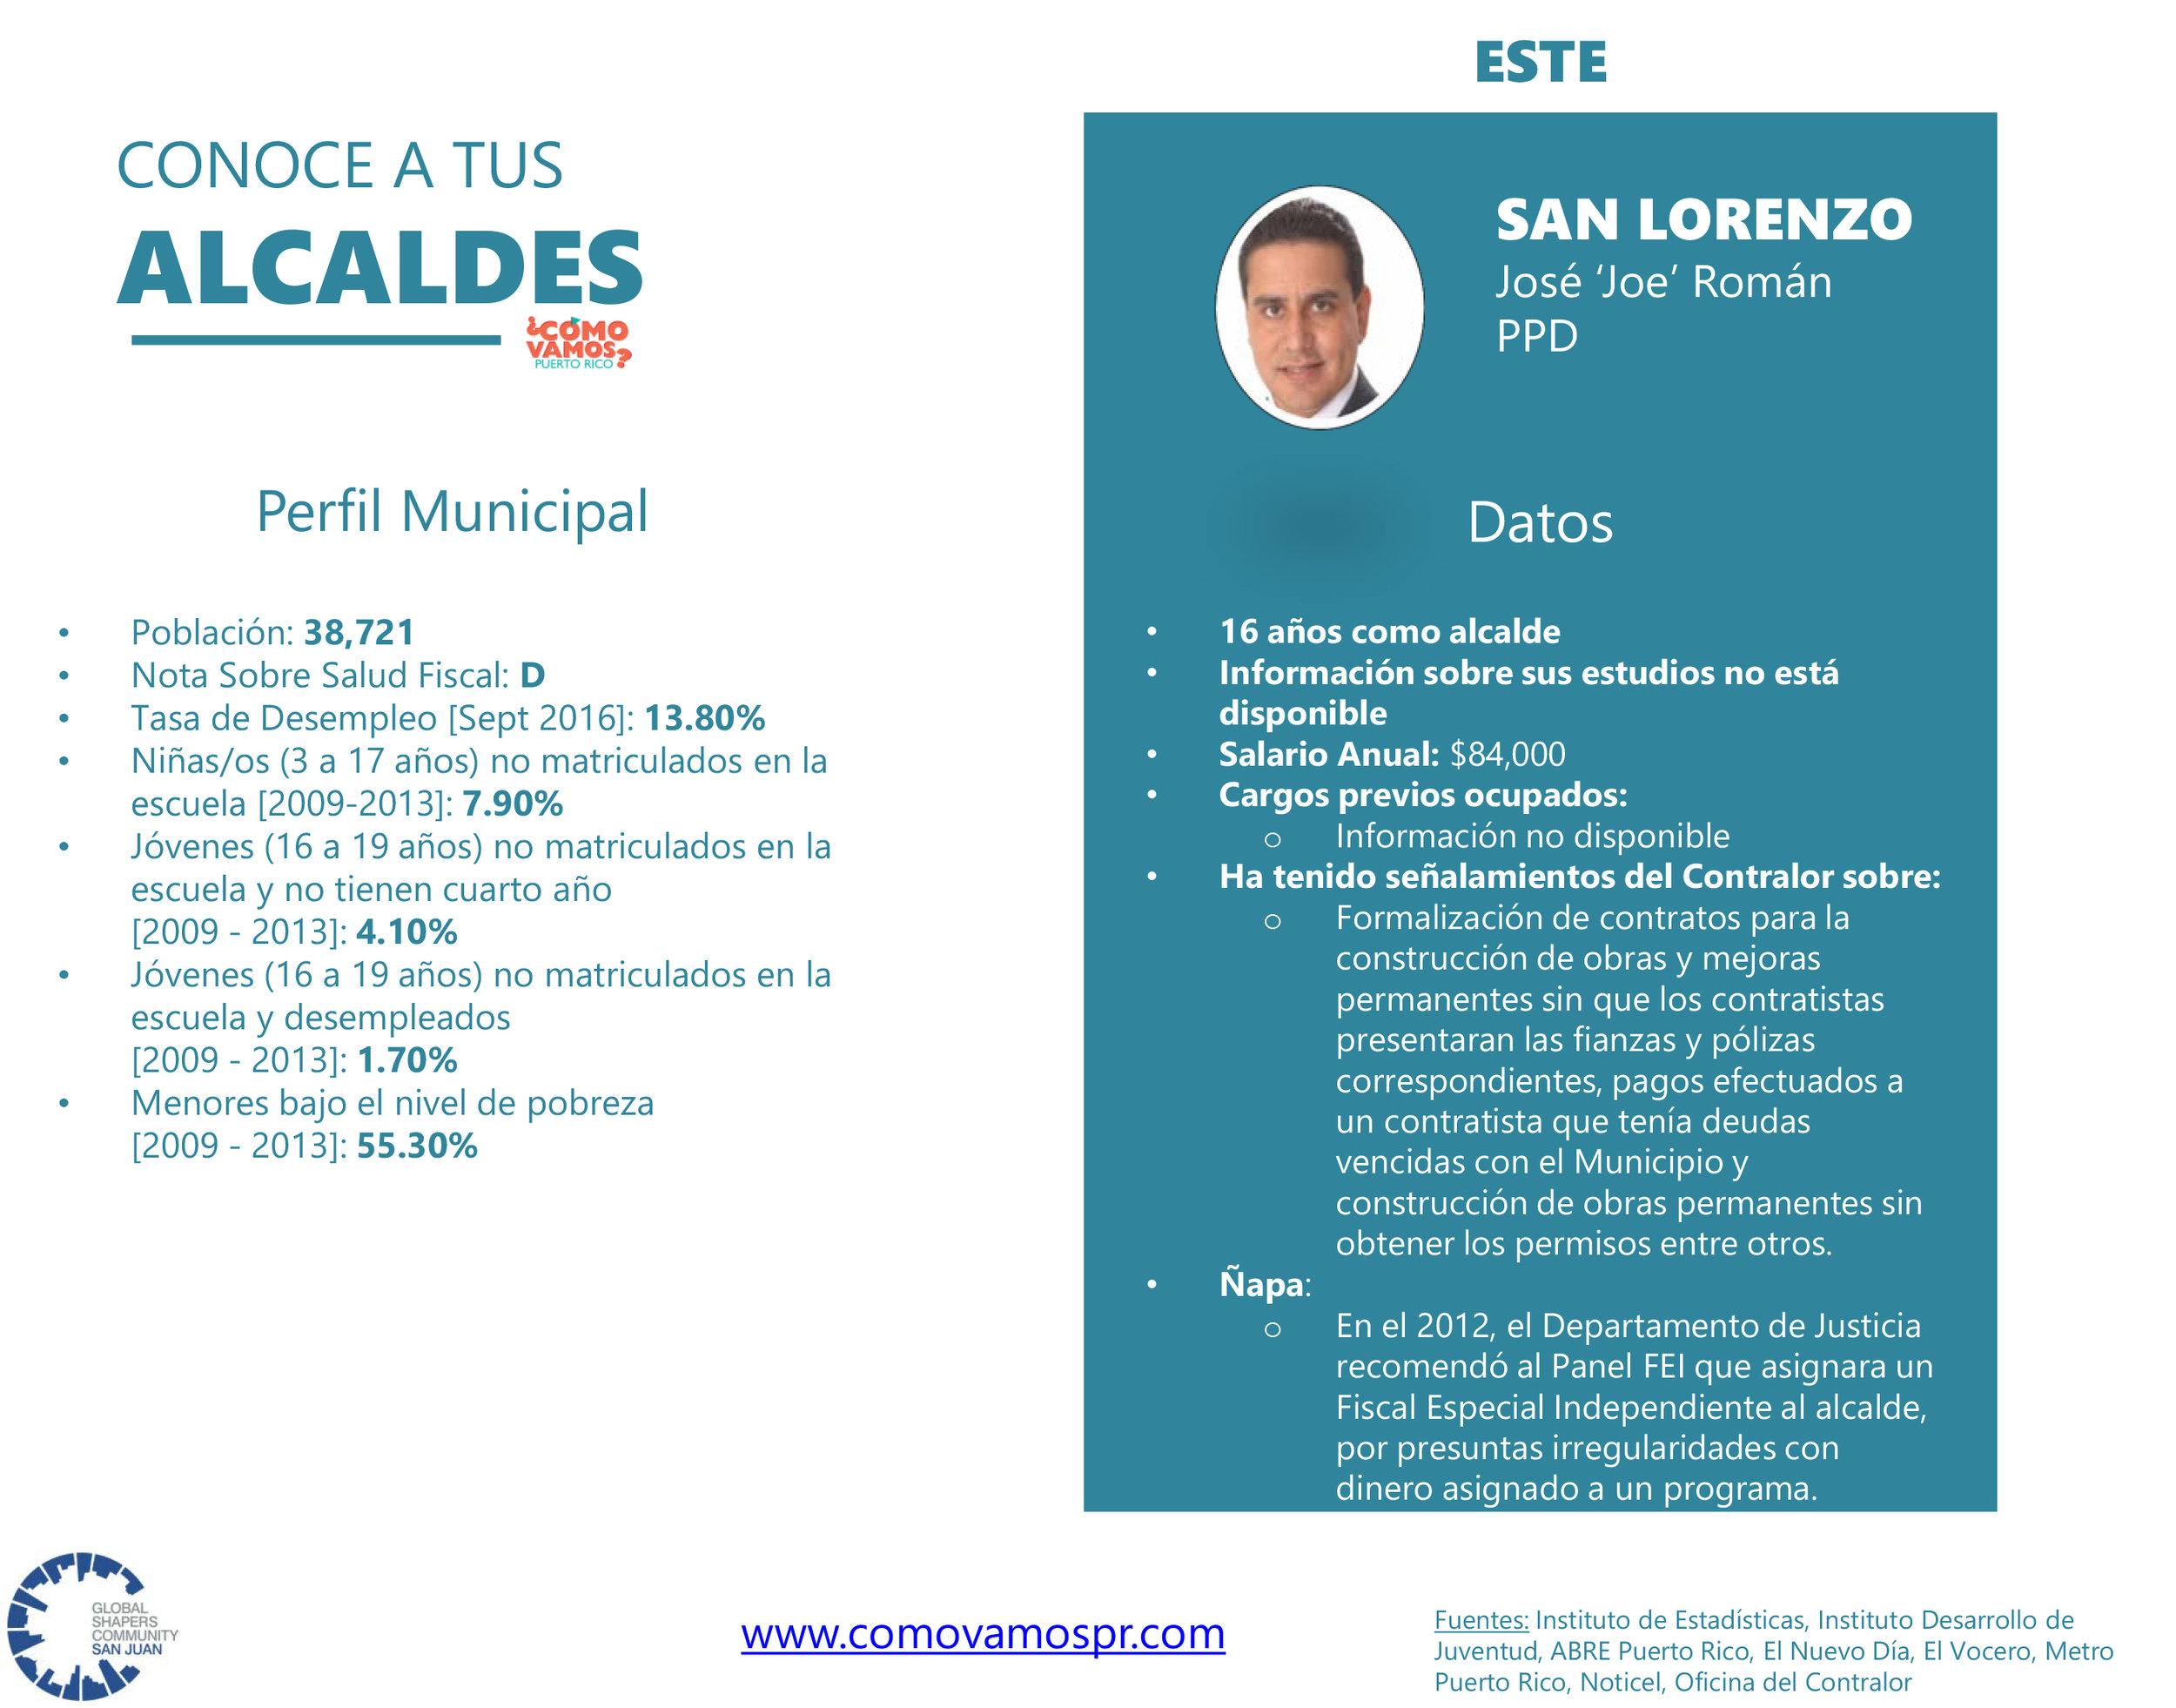 Alcaldes_Este_SanLorenzo.jpg